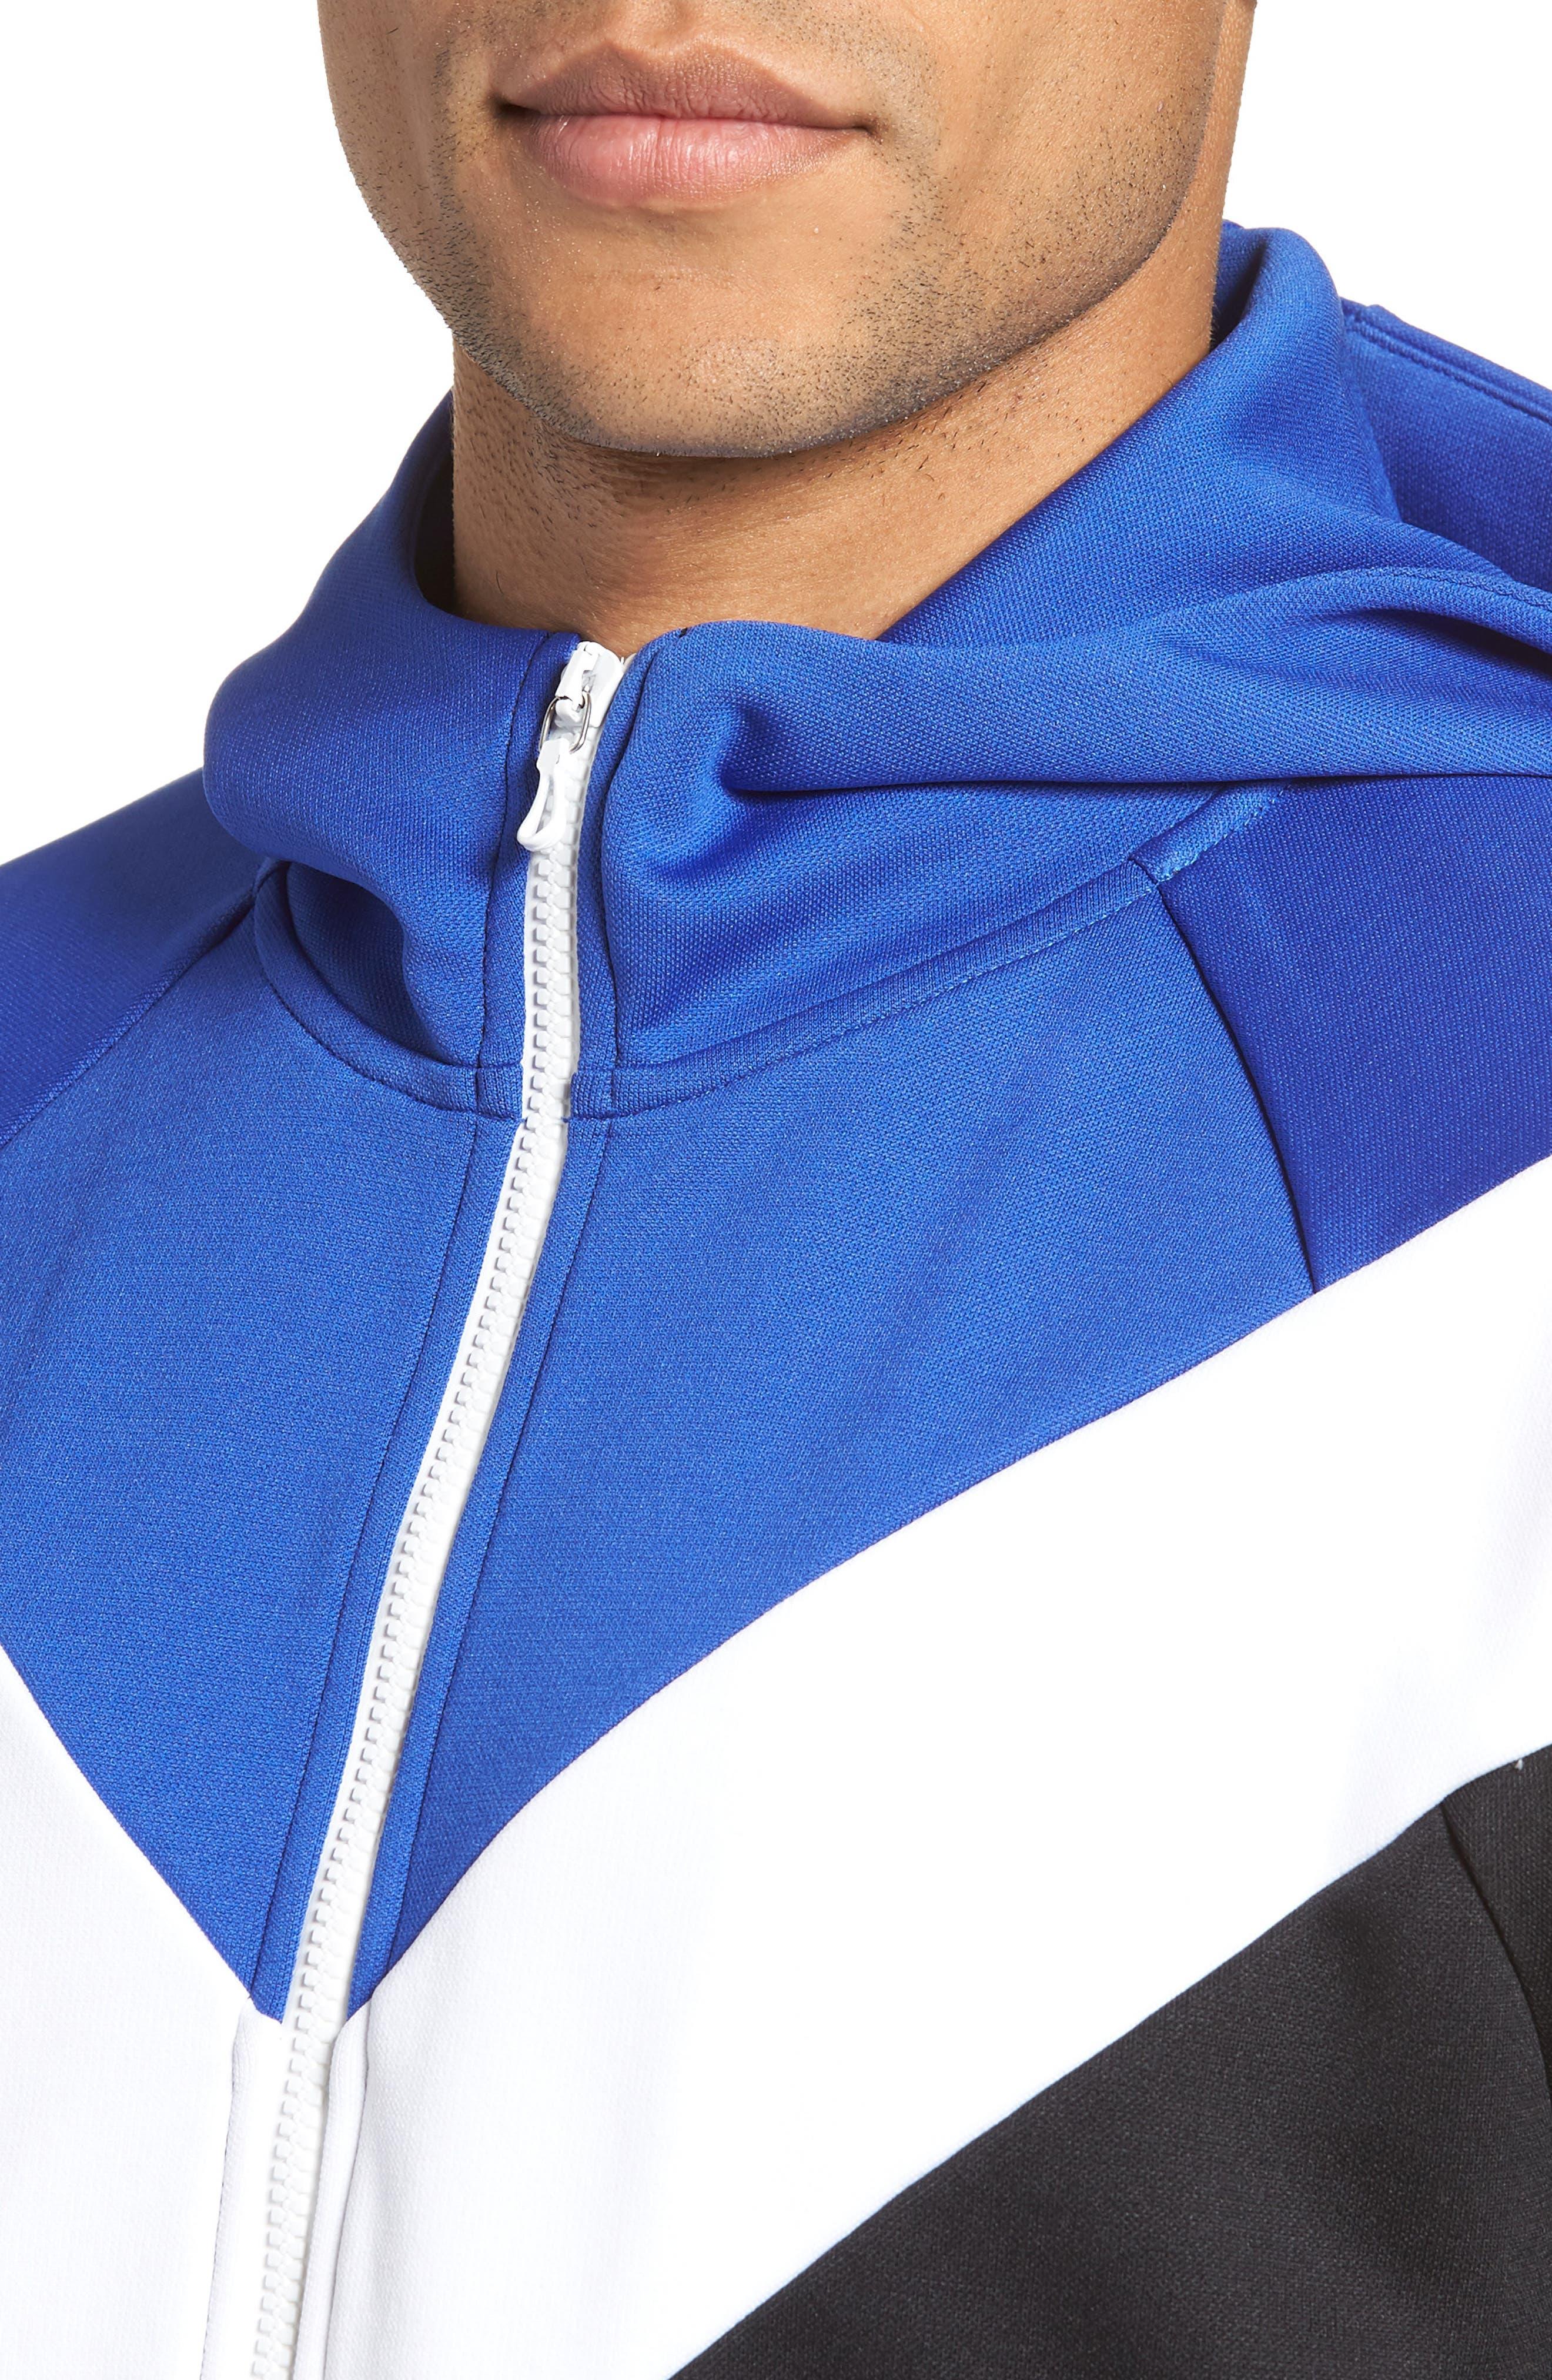 Colorblock Full Zip Hoodie,                             Alternate thumbnail 4, color,                             Blue/ White/ Black